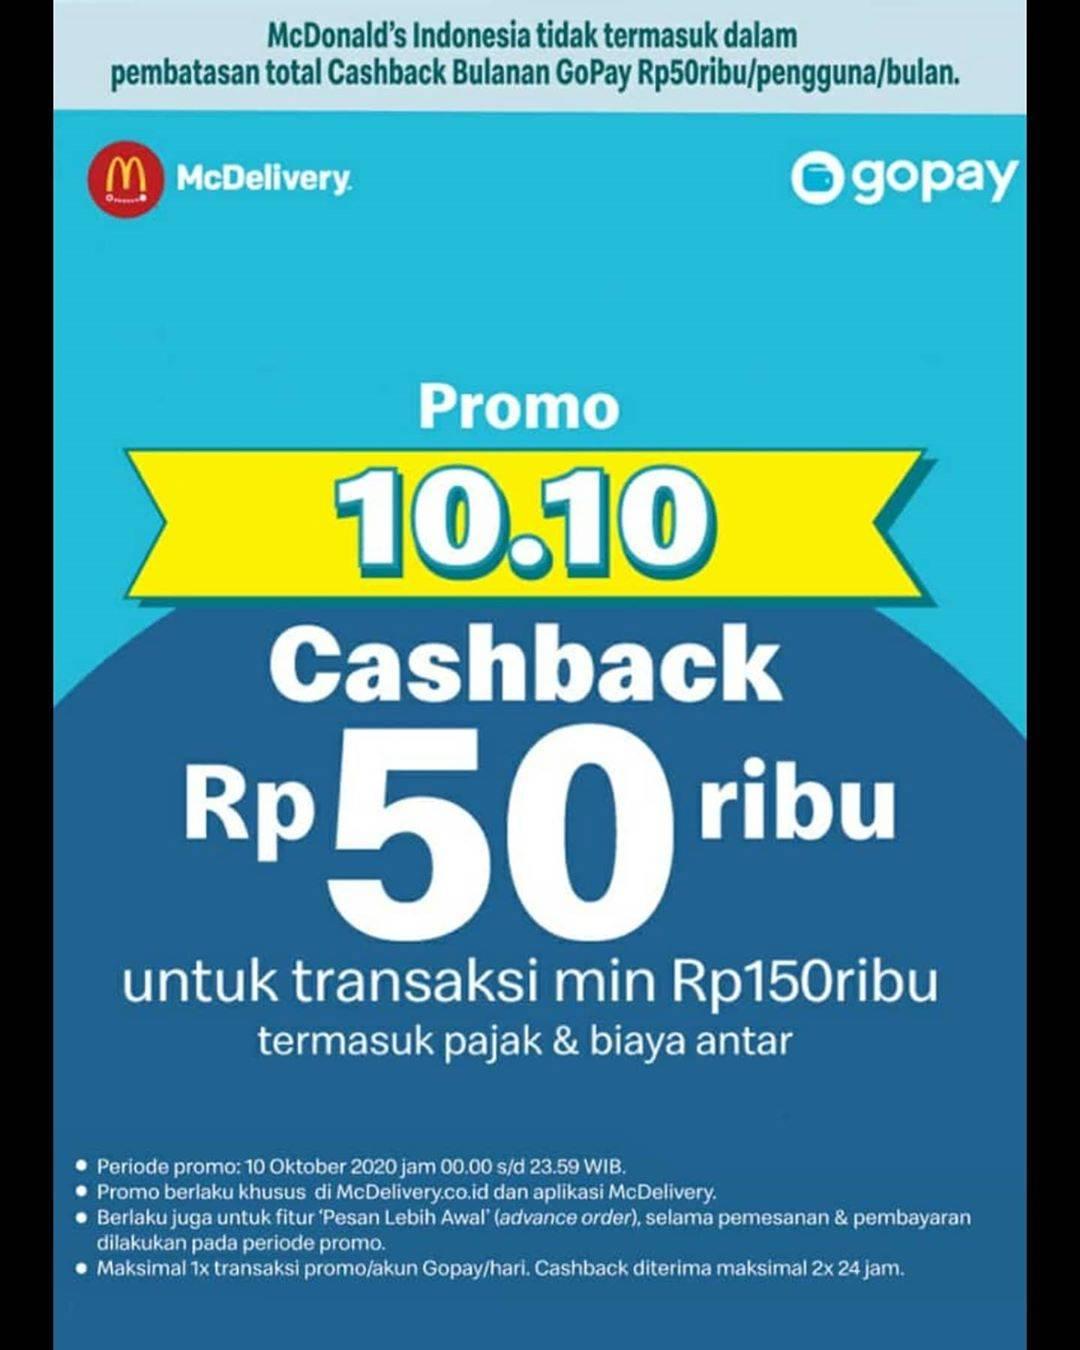 Mcdonalds Promo 10 10 Cashback Rp 50 000 Dari Gopay Disqonin